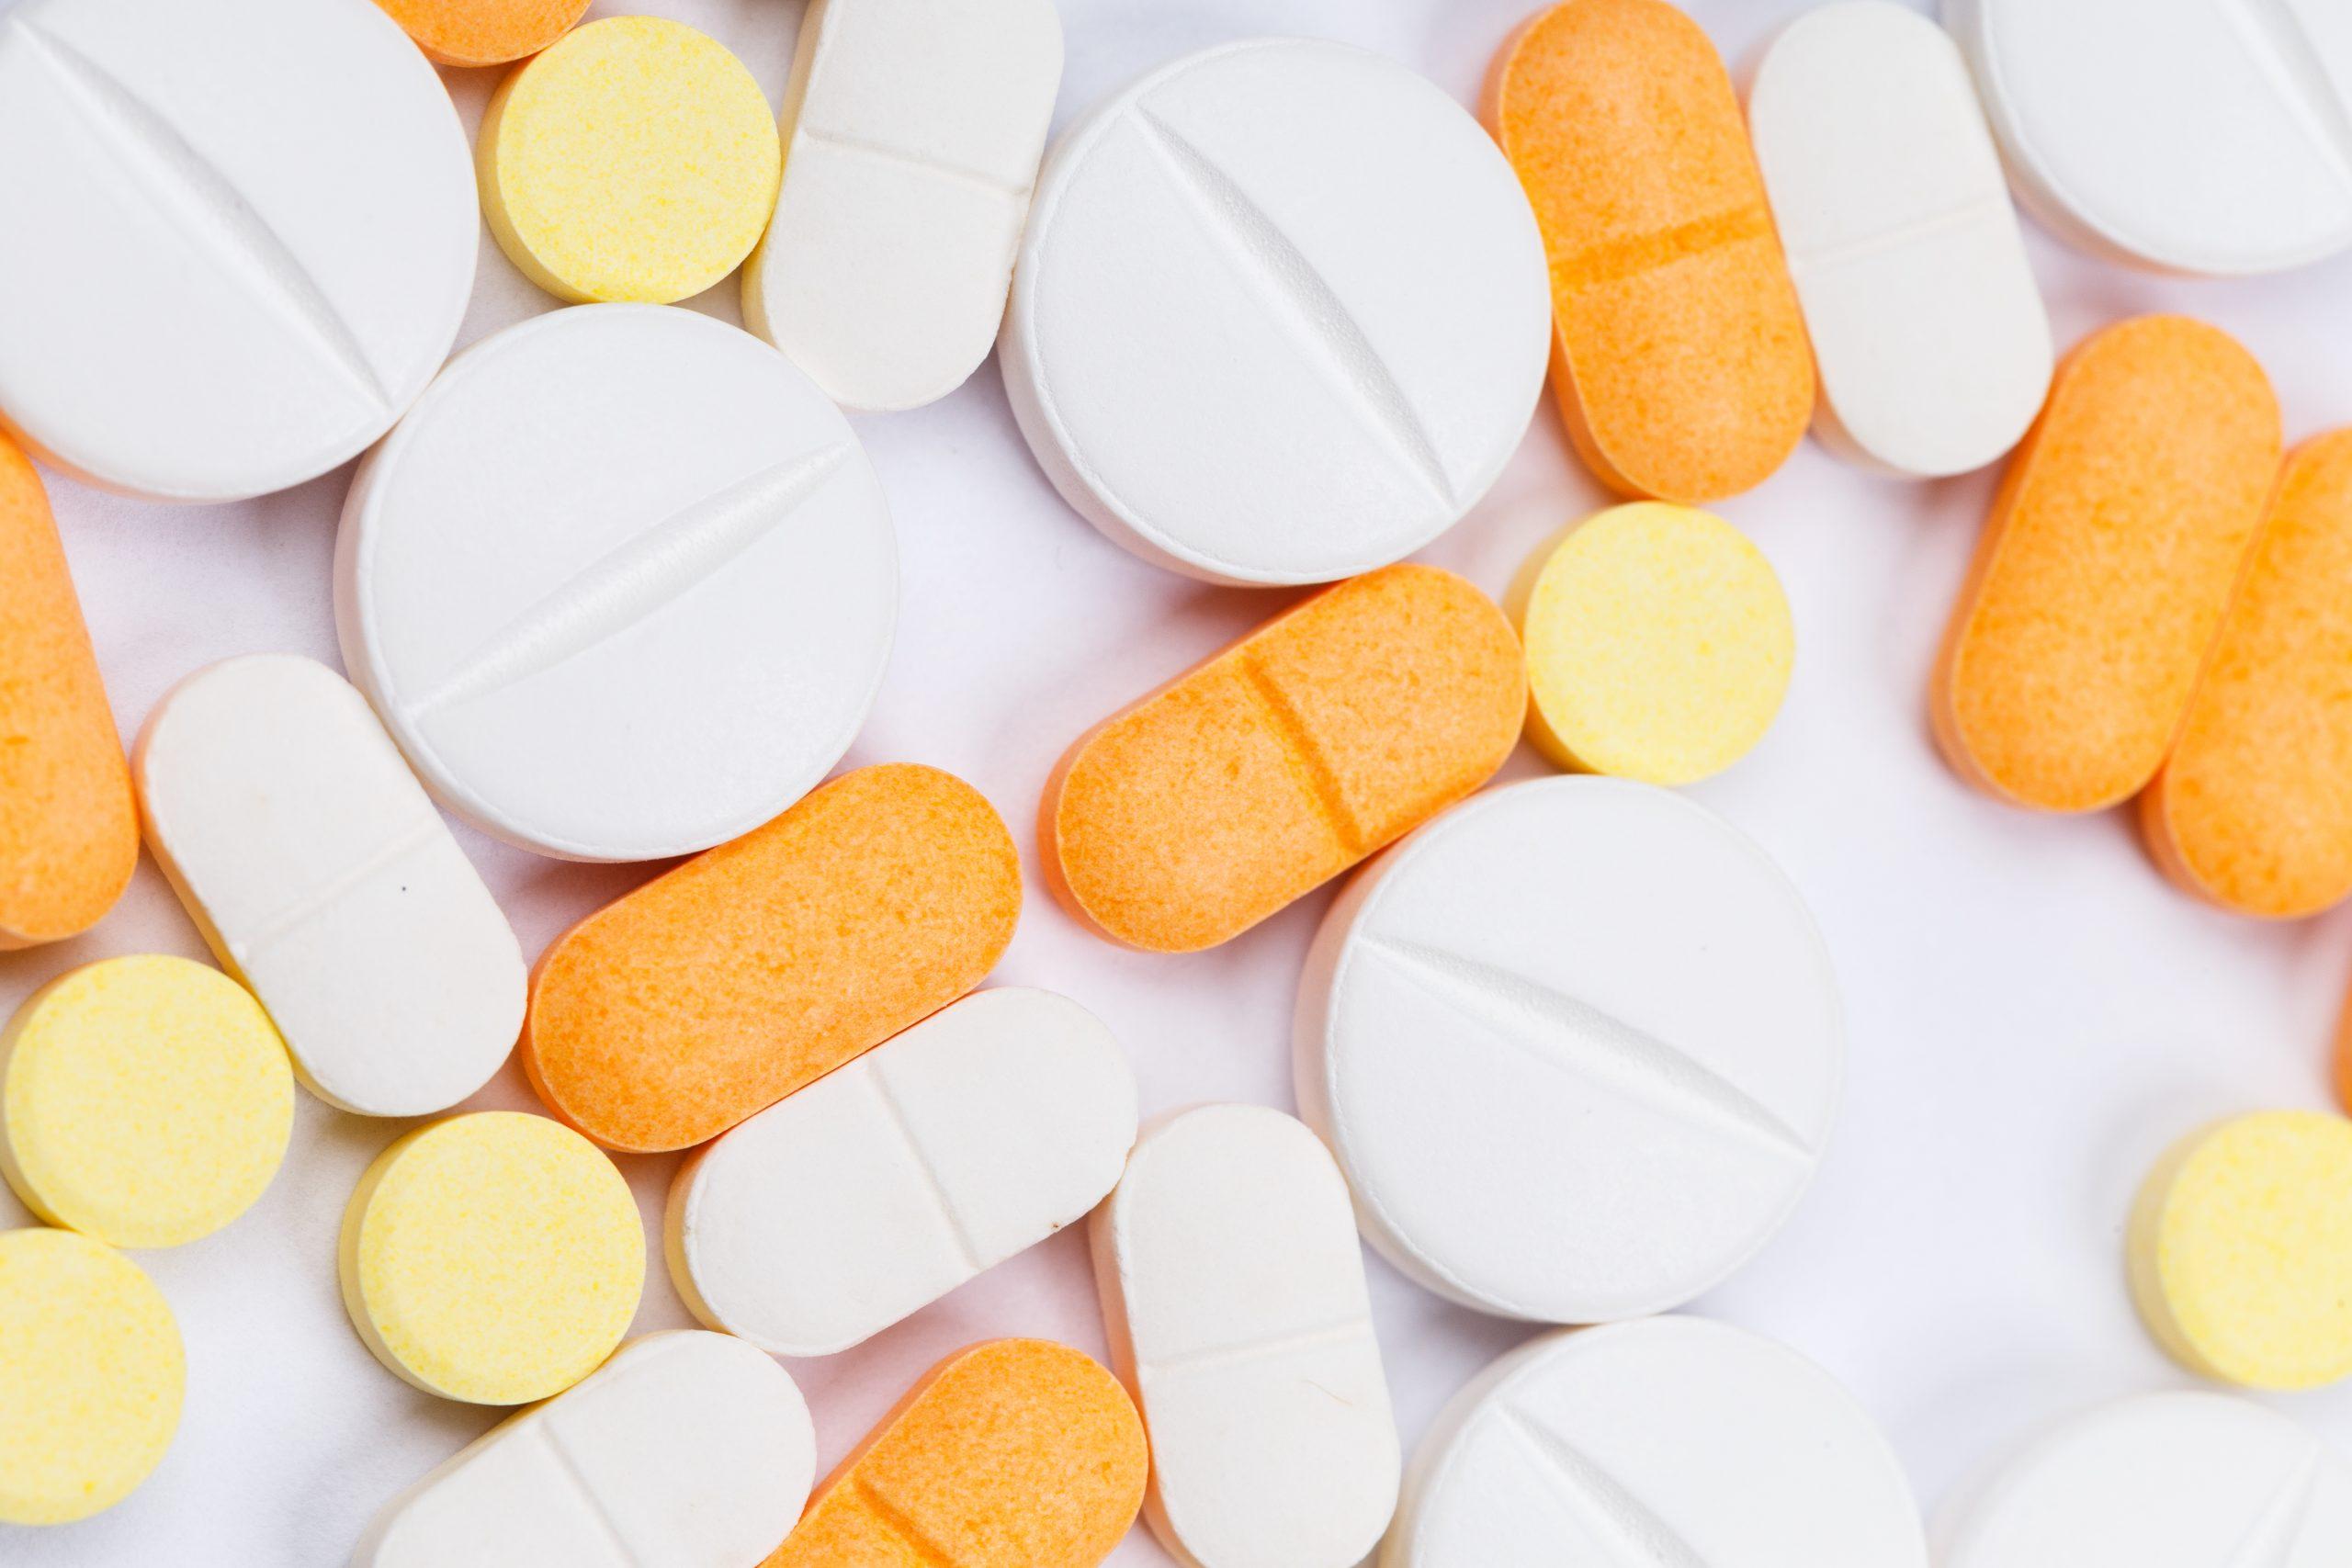 drugs 866G79Y scaled наркотики наркотики